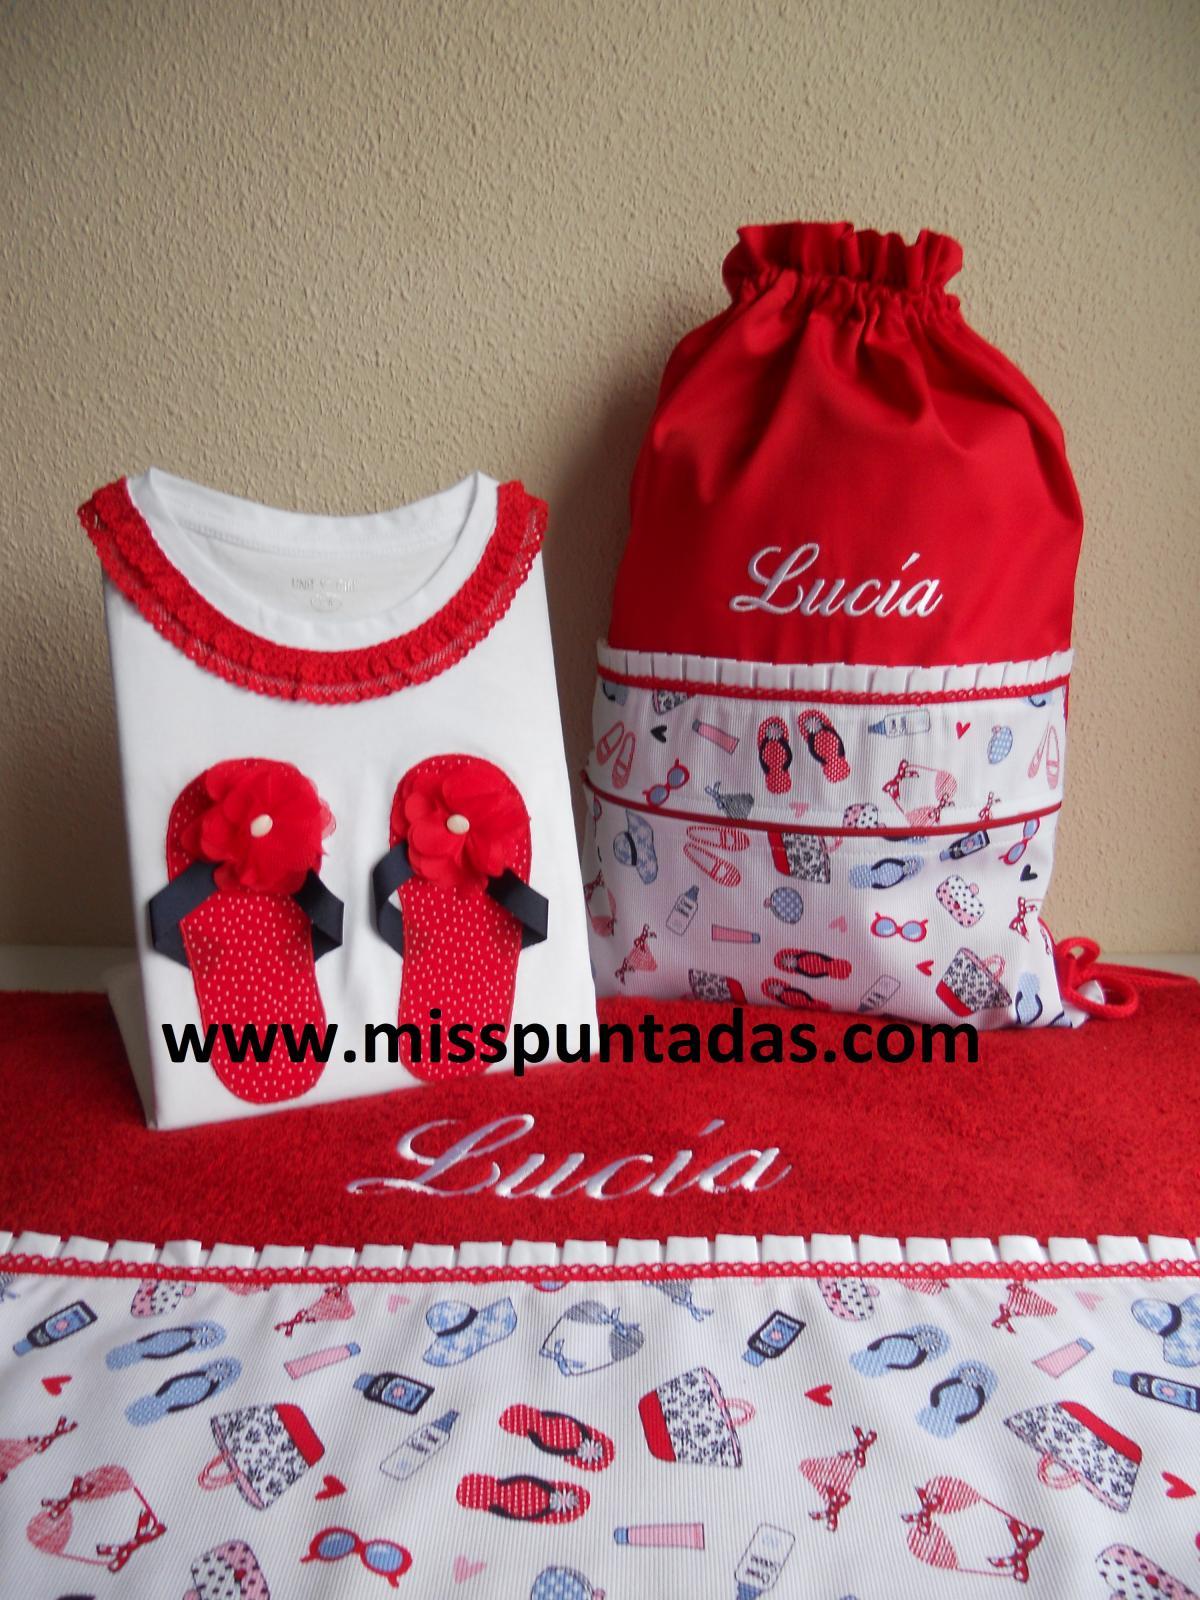 Bolsa /mochila Lucía.